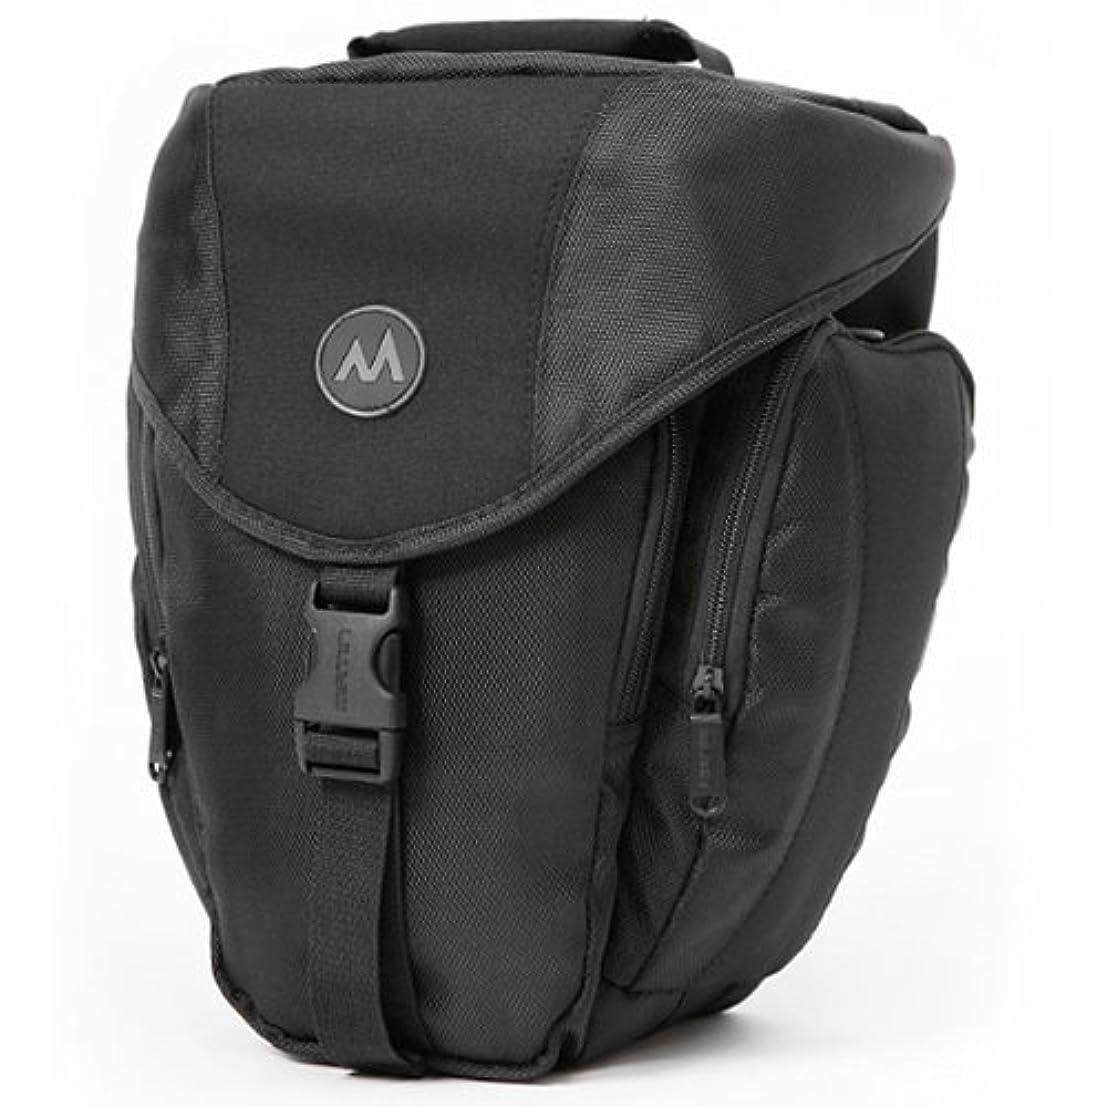 MATIN D-SLR RF Mirrorless Camera Lens Cushion Padded Action Zoom Shoulder Bag Case PONY-19